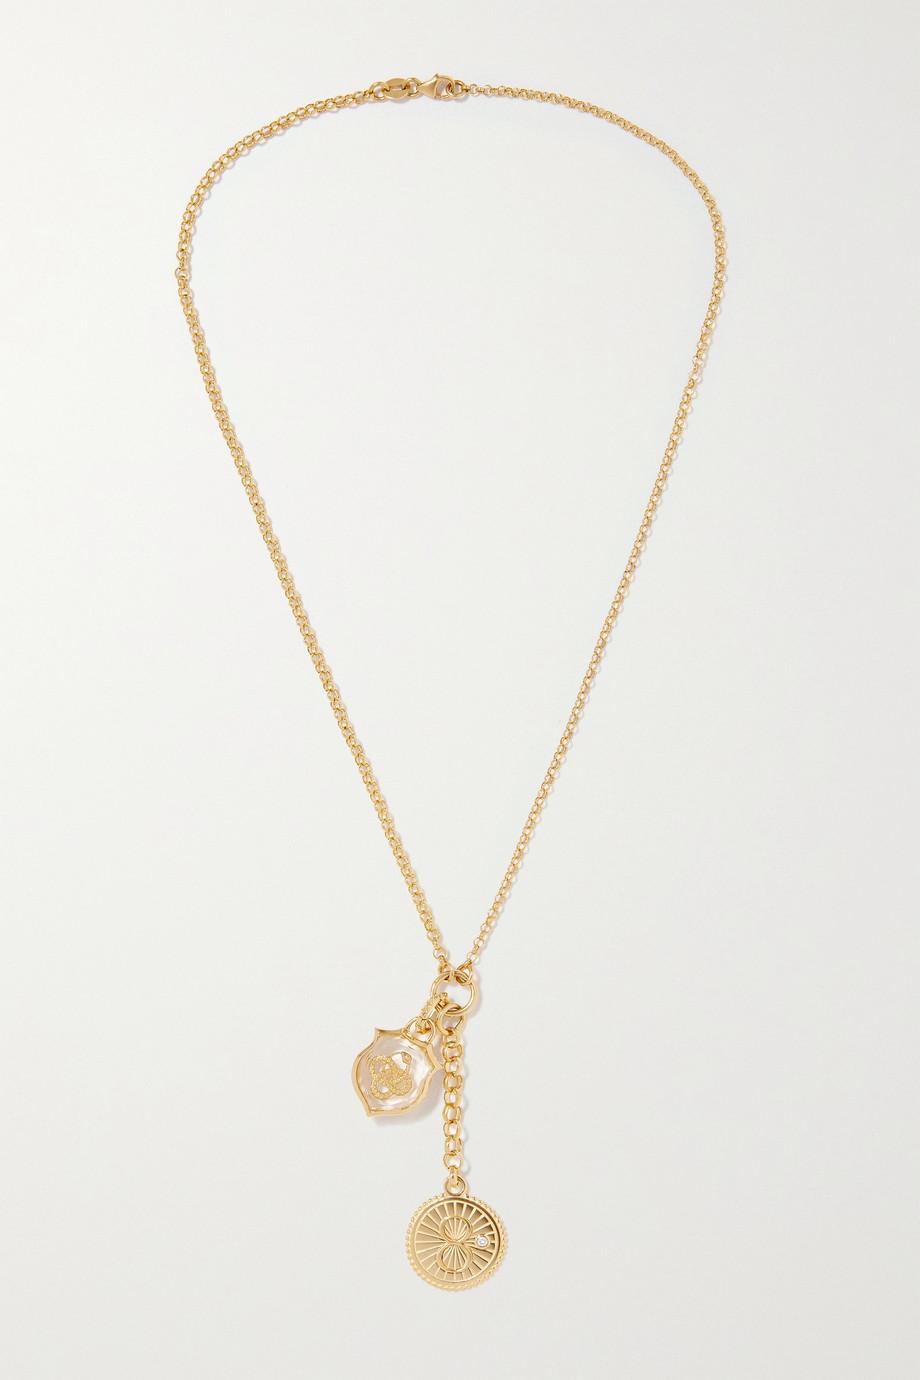 Foundrae Karma and Wholeness 18-karat gold, quartz and diamond necklace